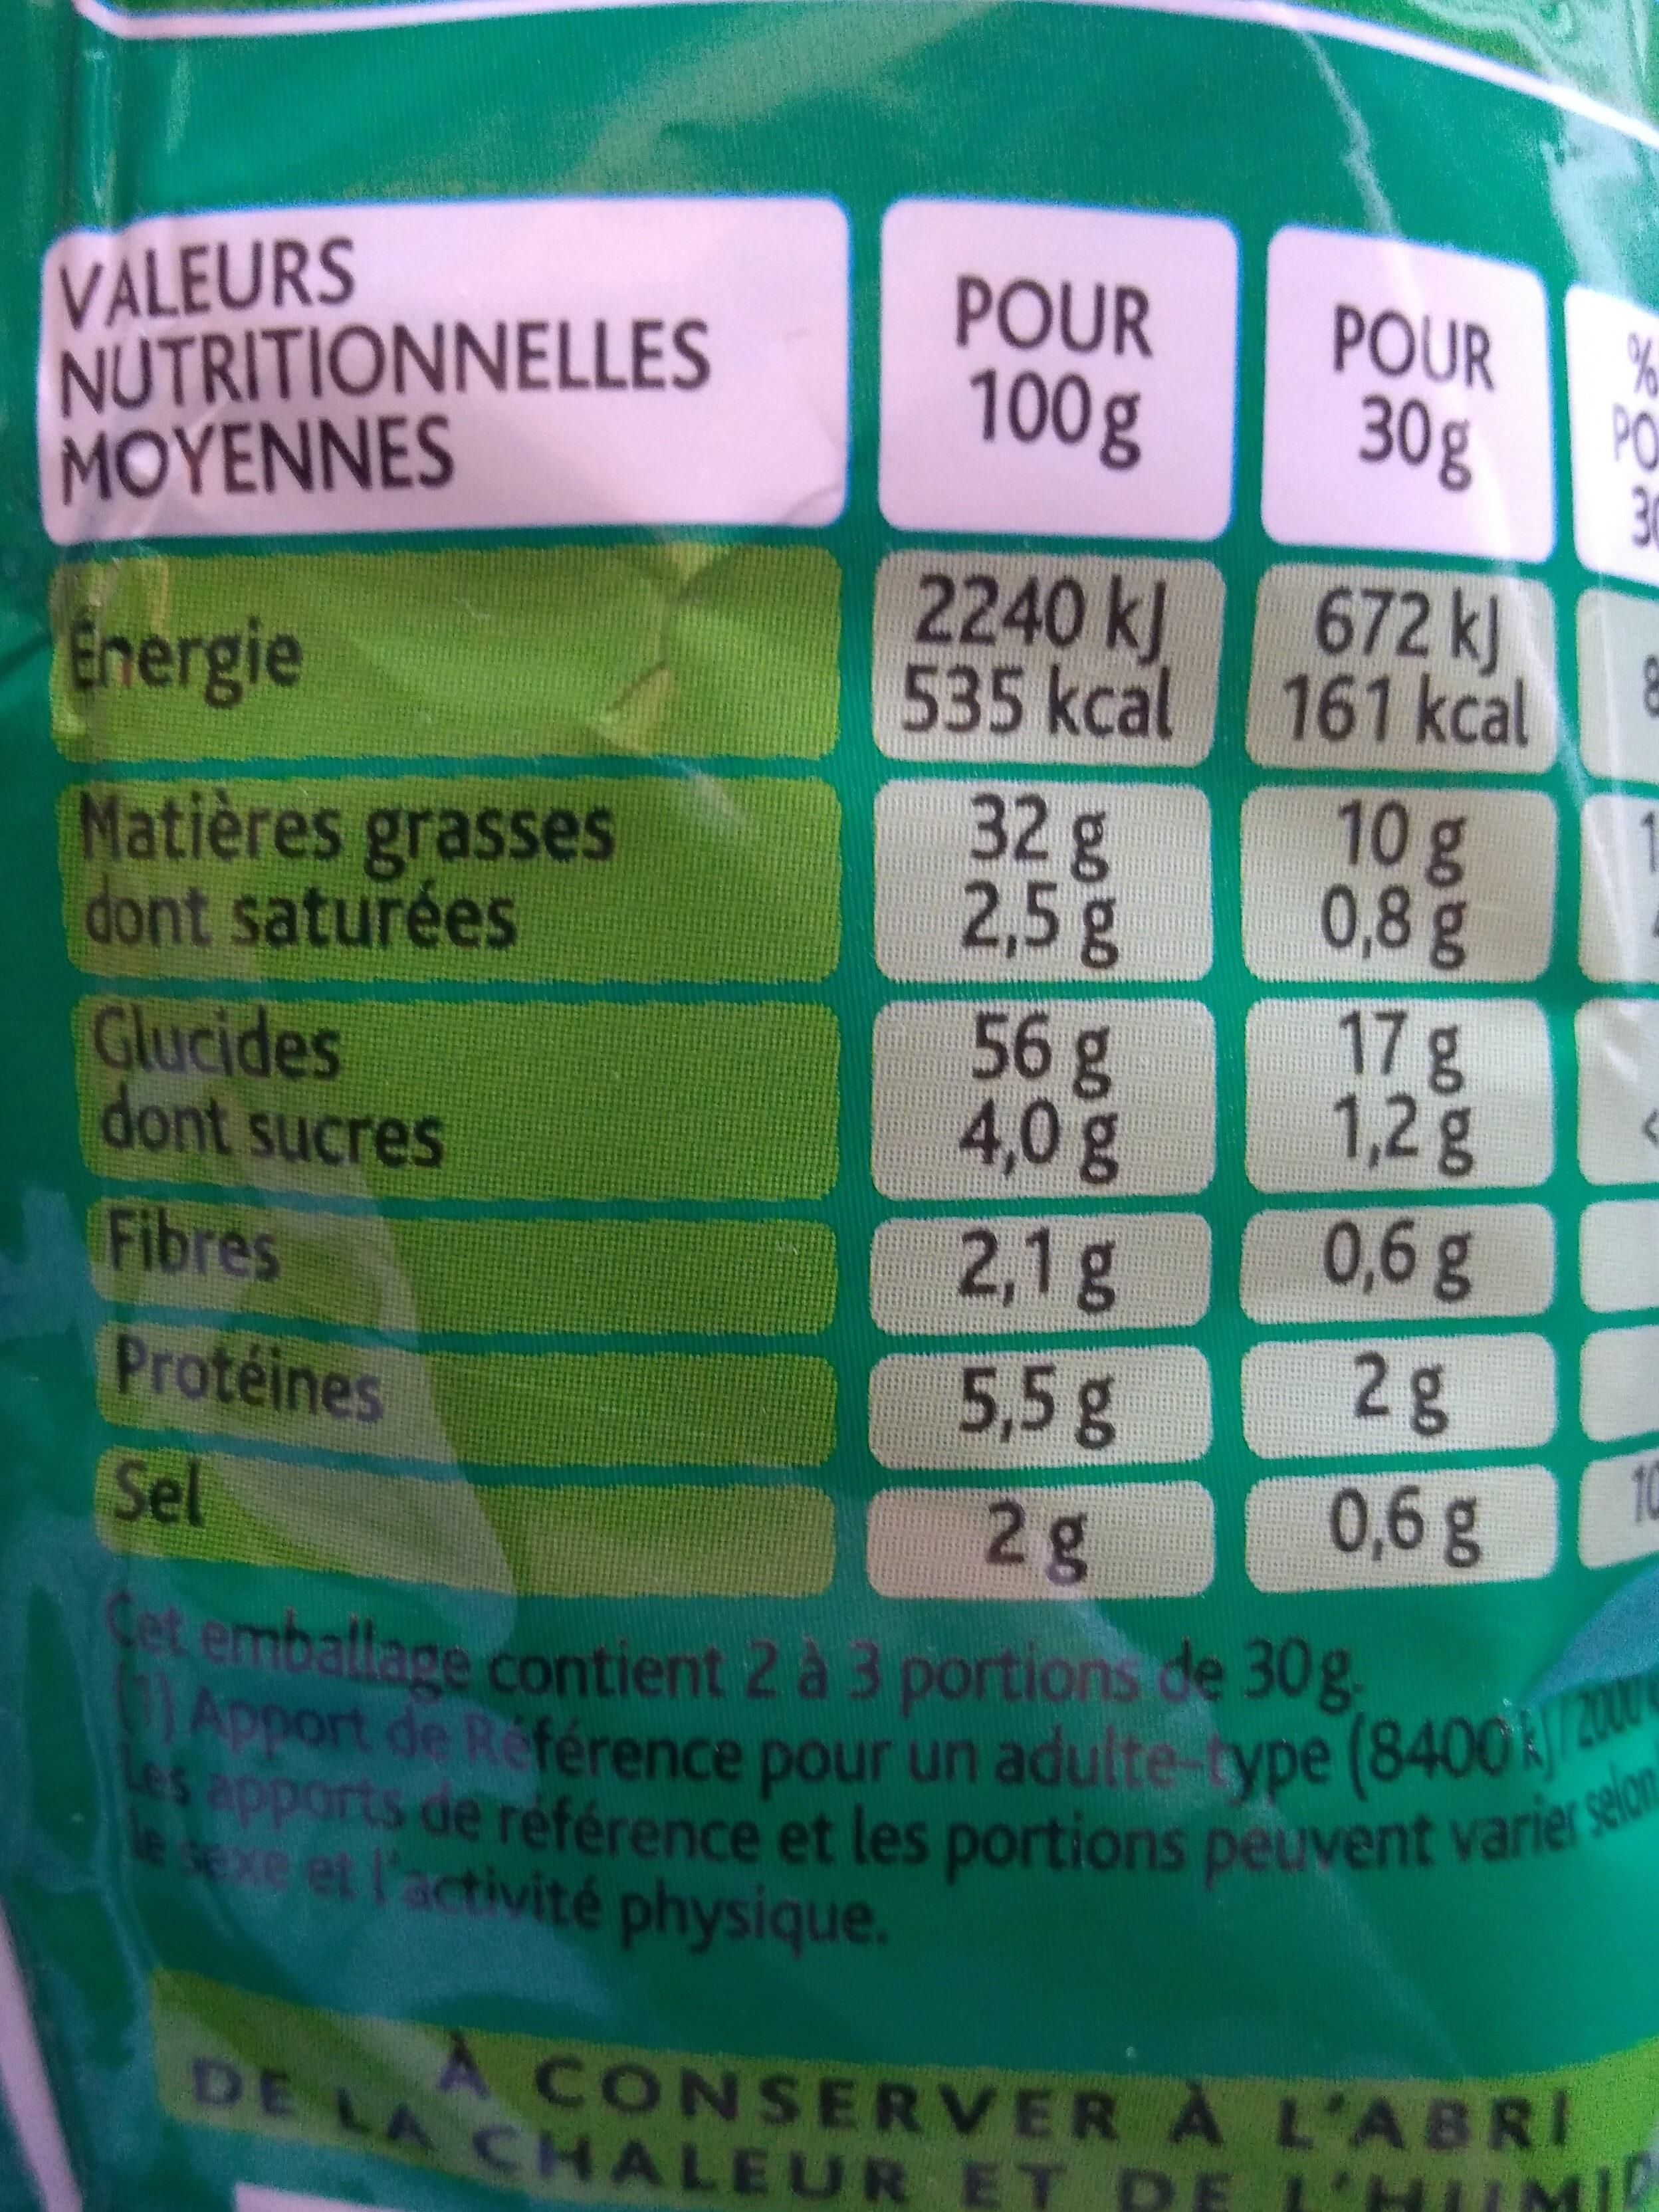 3D's Bugles, Goût Fromage - Informations nutritionnelles